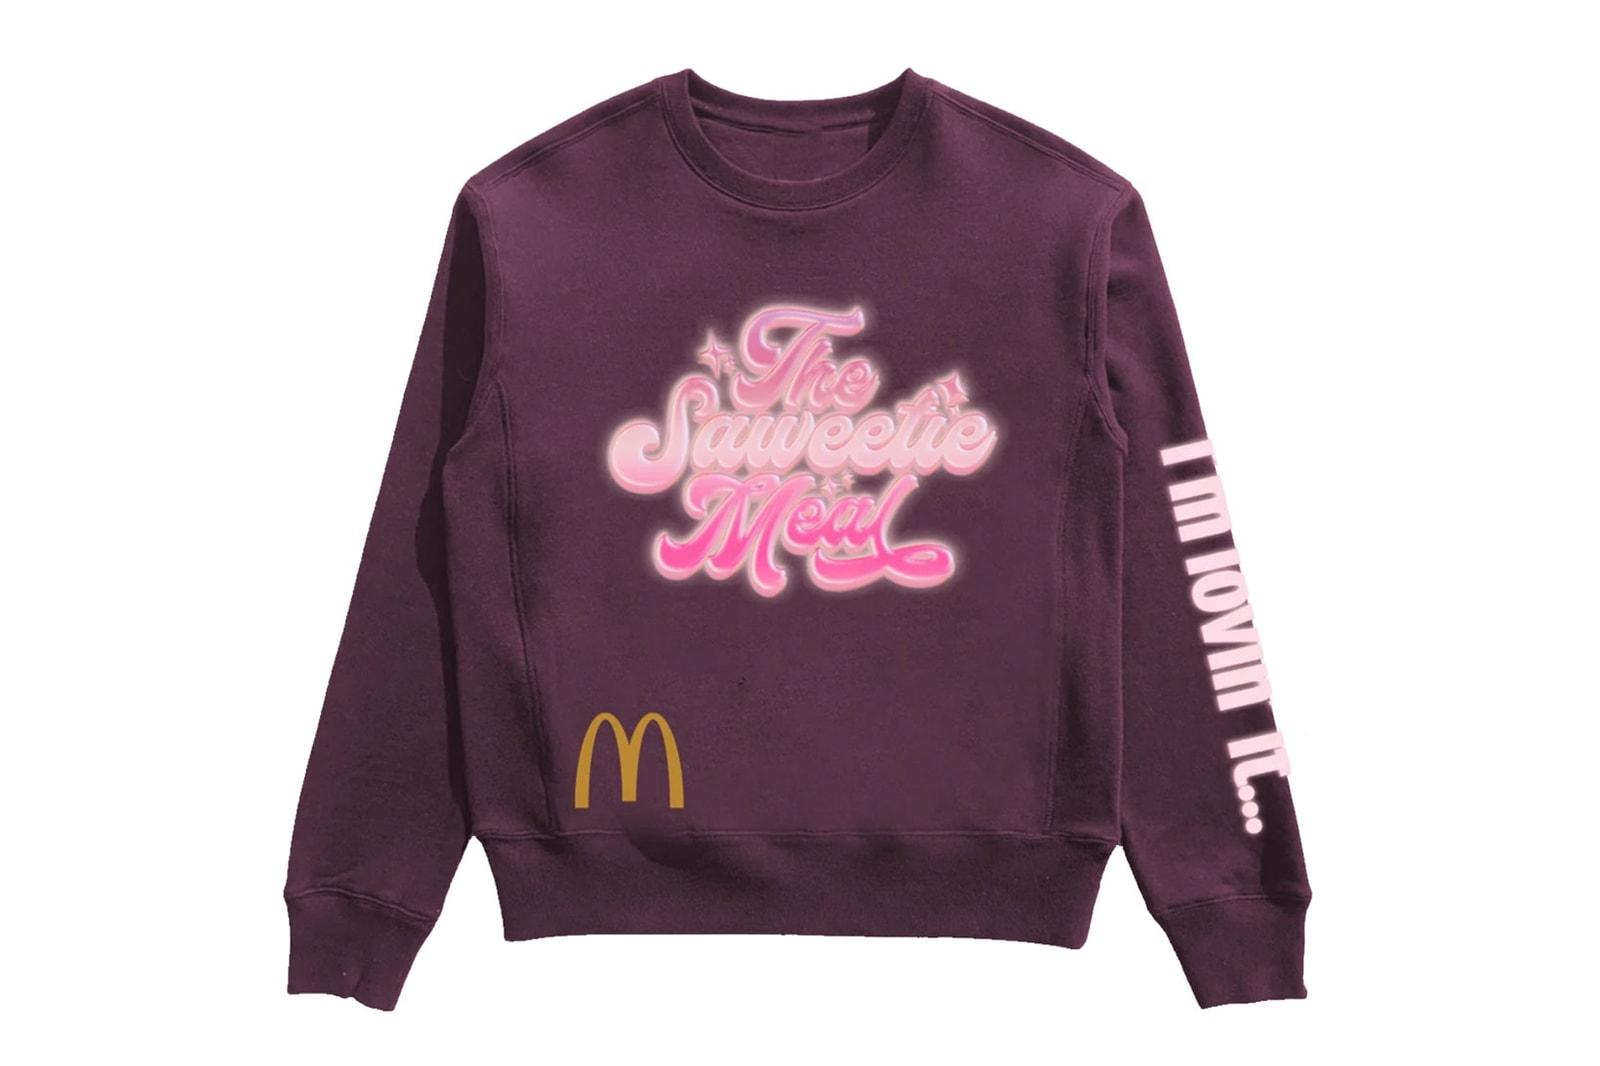 Saweetie McDonald's Collaboration Meal Merch Hoodies Sweatpants Rapper Music Artist